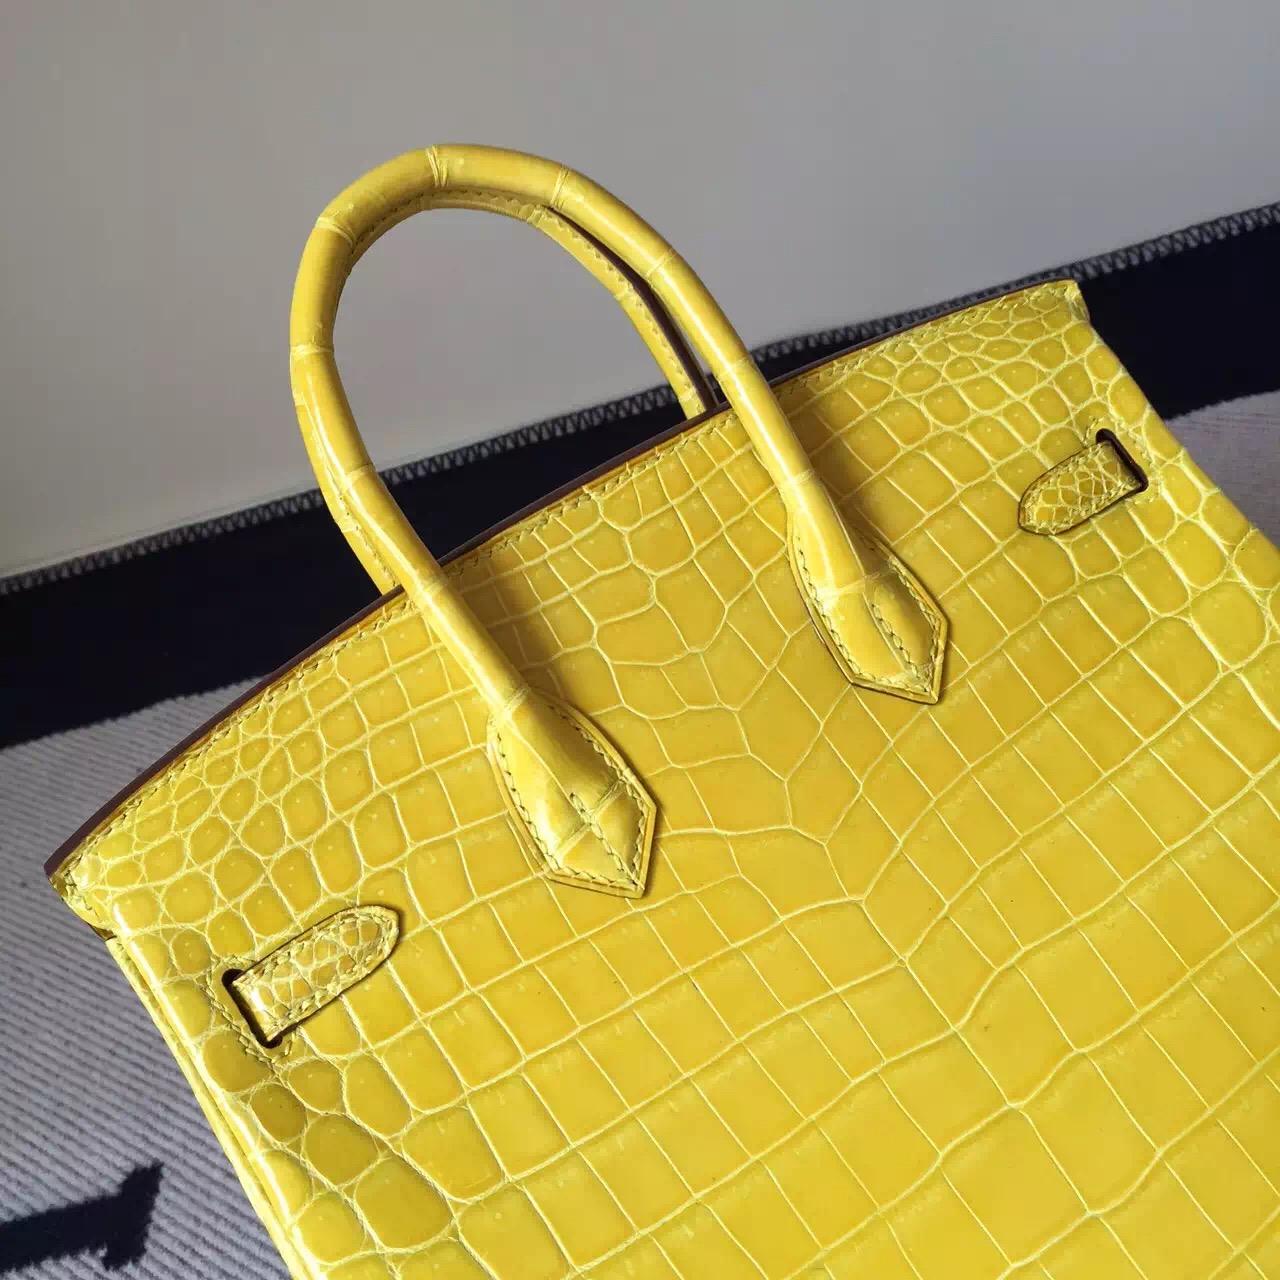 Sale Hermes M9 Lemone Yellow Crocodile Shiny Leather Birkin25cm Bag